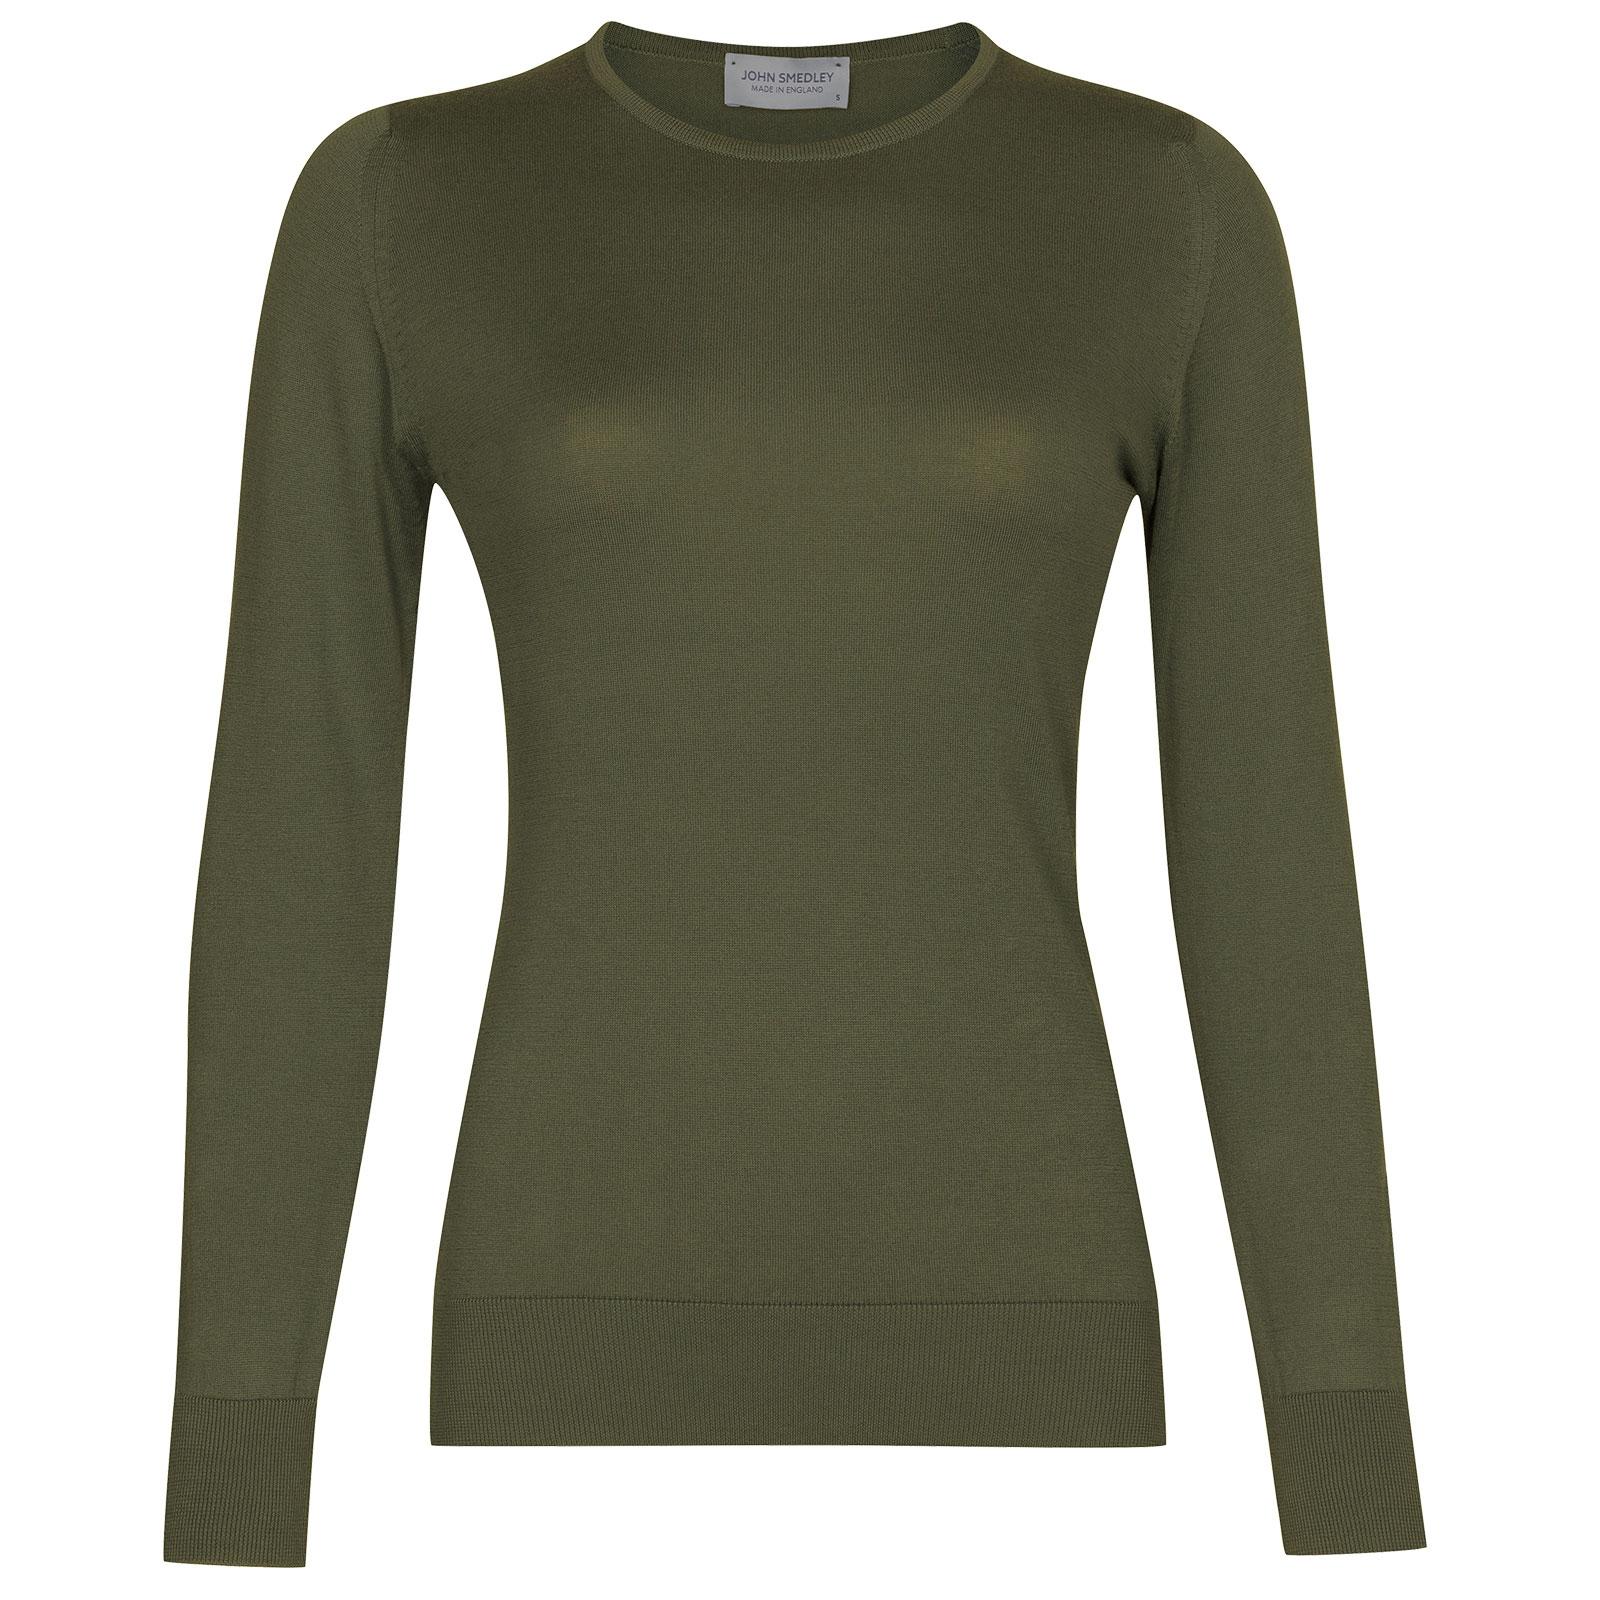 John Smedley Paddington in Sepal Green Sweater-SML